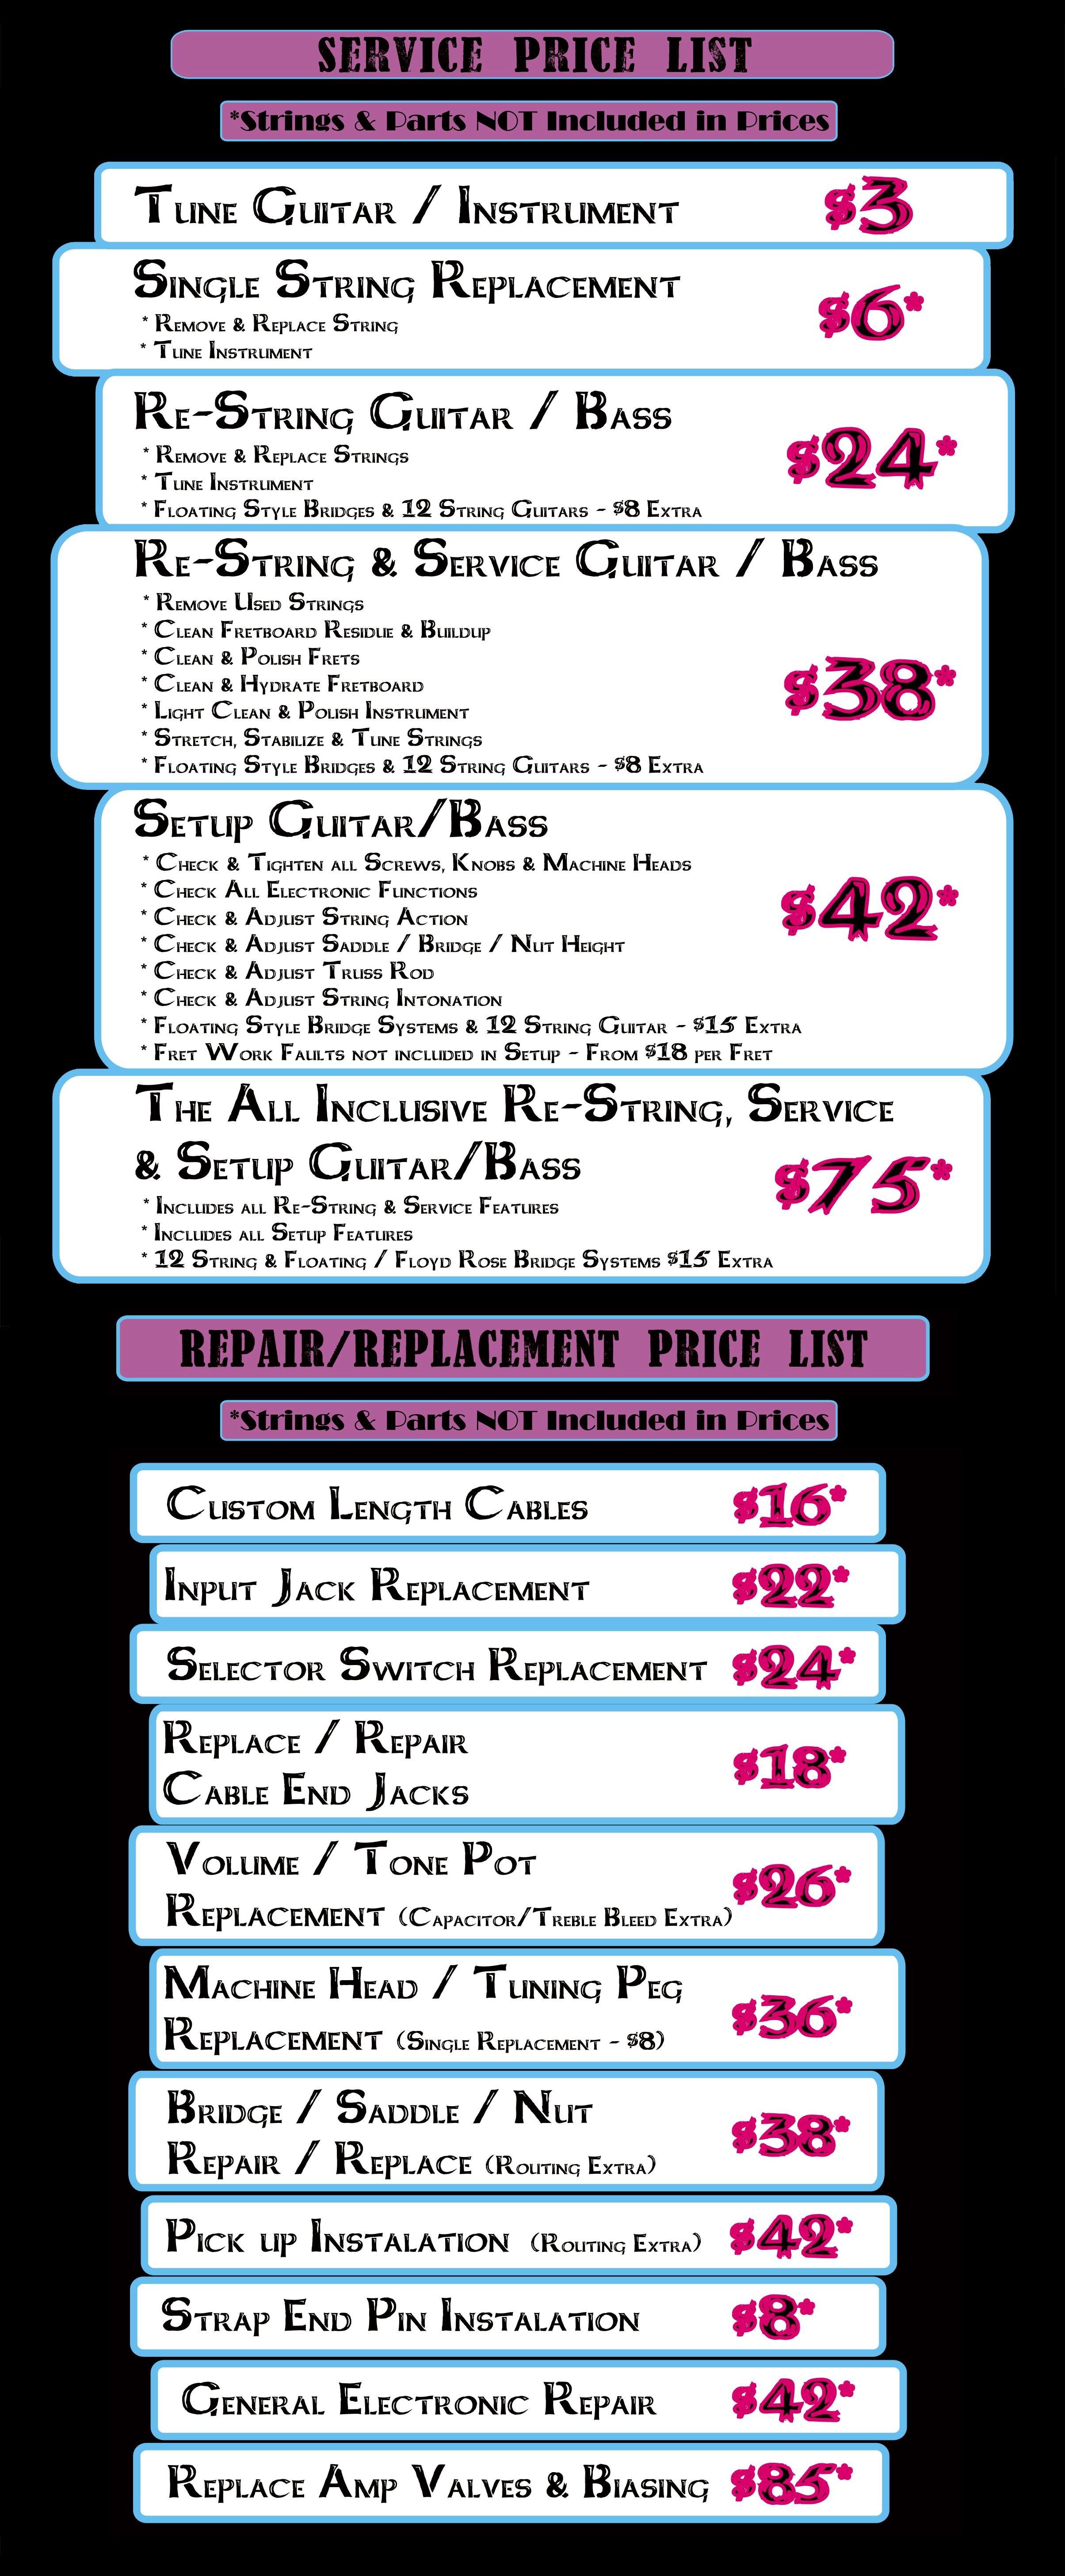 service-repair-price-list-2020-copy.jpg